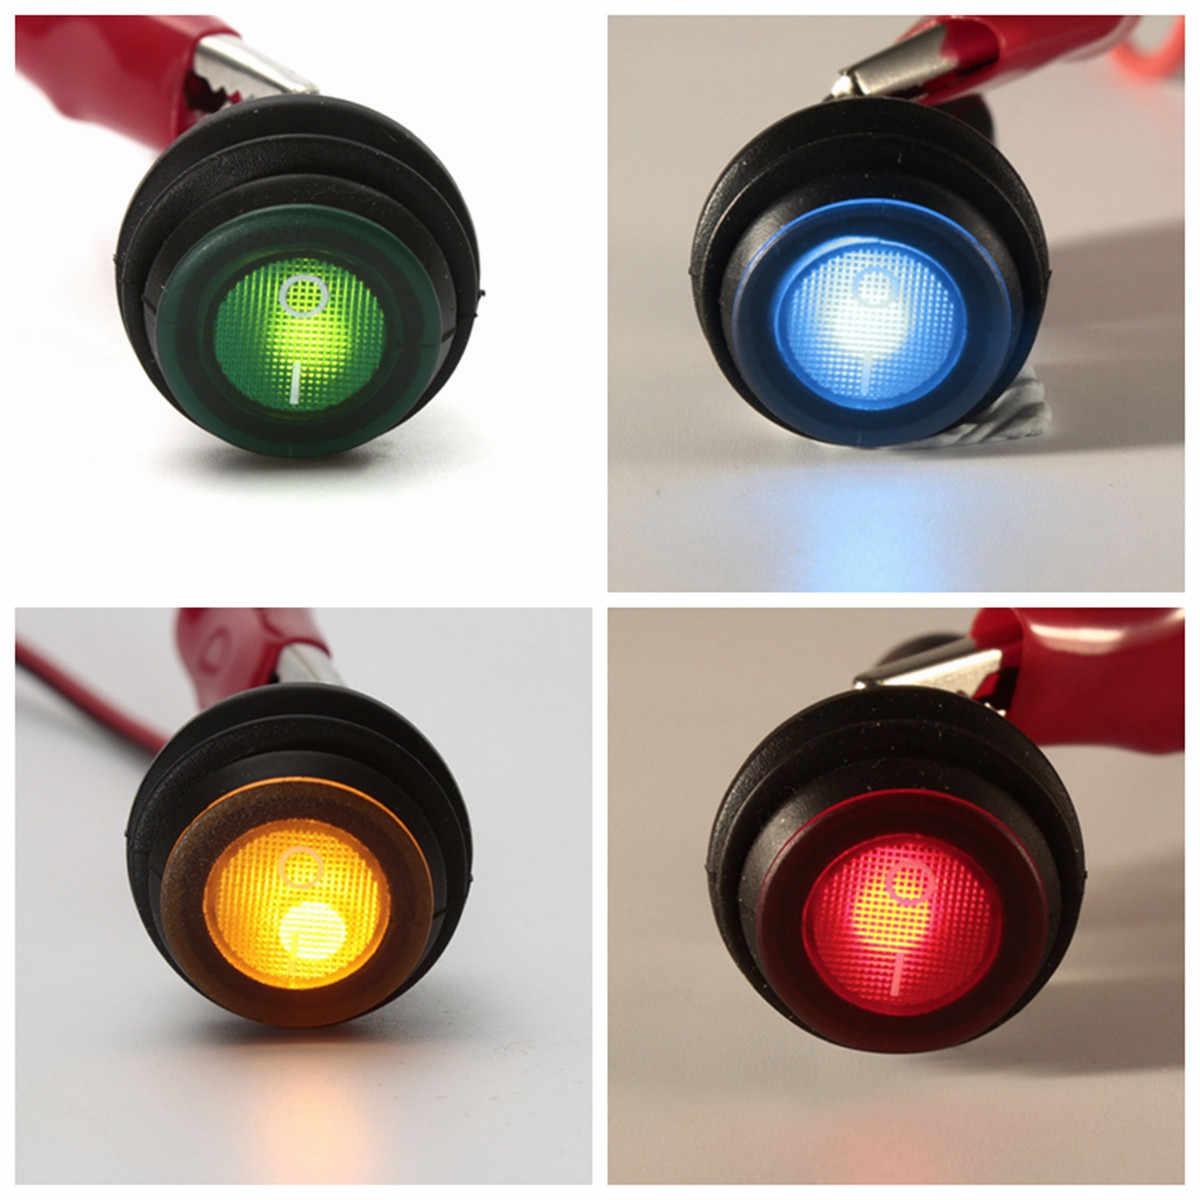 6/10 Uds. 12V 24V LED redondo interruptor basculante encendido/apagado Azul Rojo verde amarillo interruptores oscilantes impermeables para coche barco marino